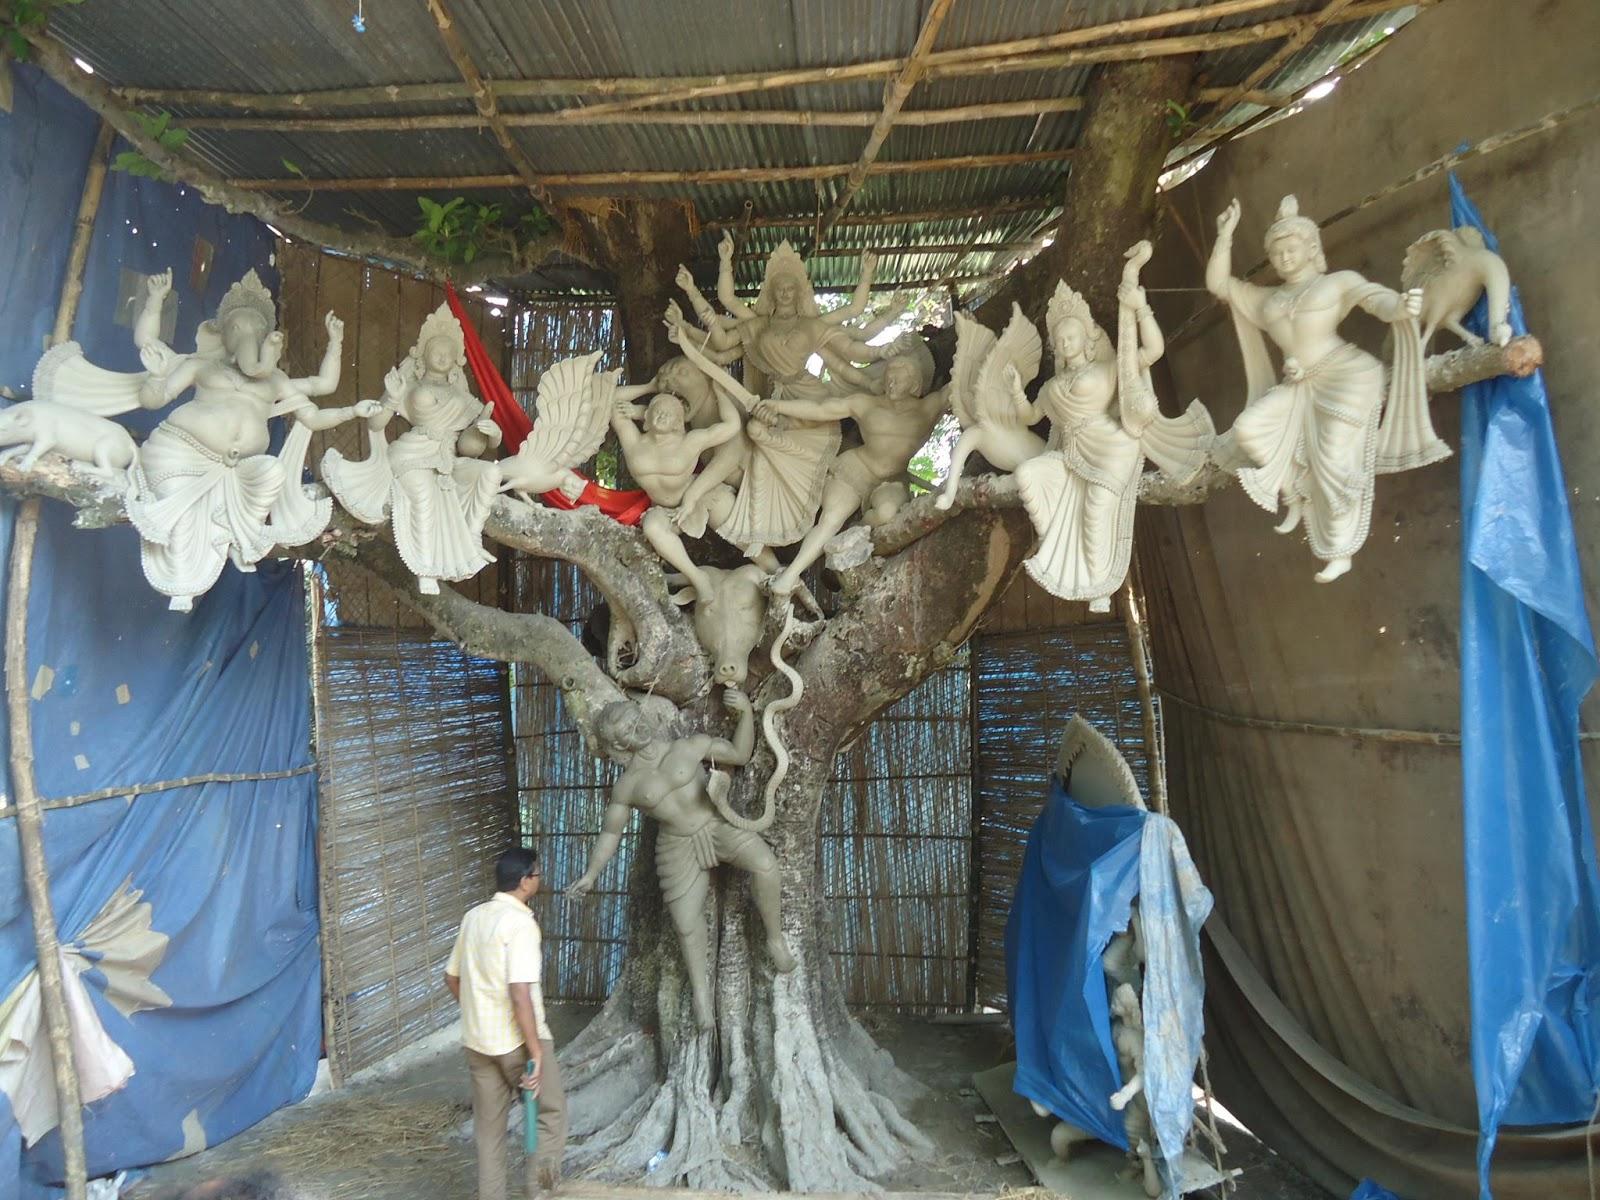 http://2.bp.blogspot.com/-z9ZQW-2oTmA/UHl6Bo9UFgI/AAAAAAAAFJ0/CSOQ7KxXScc/s1600/Durga-chittagong.jpg